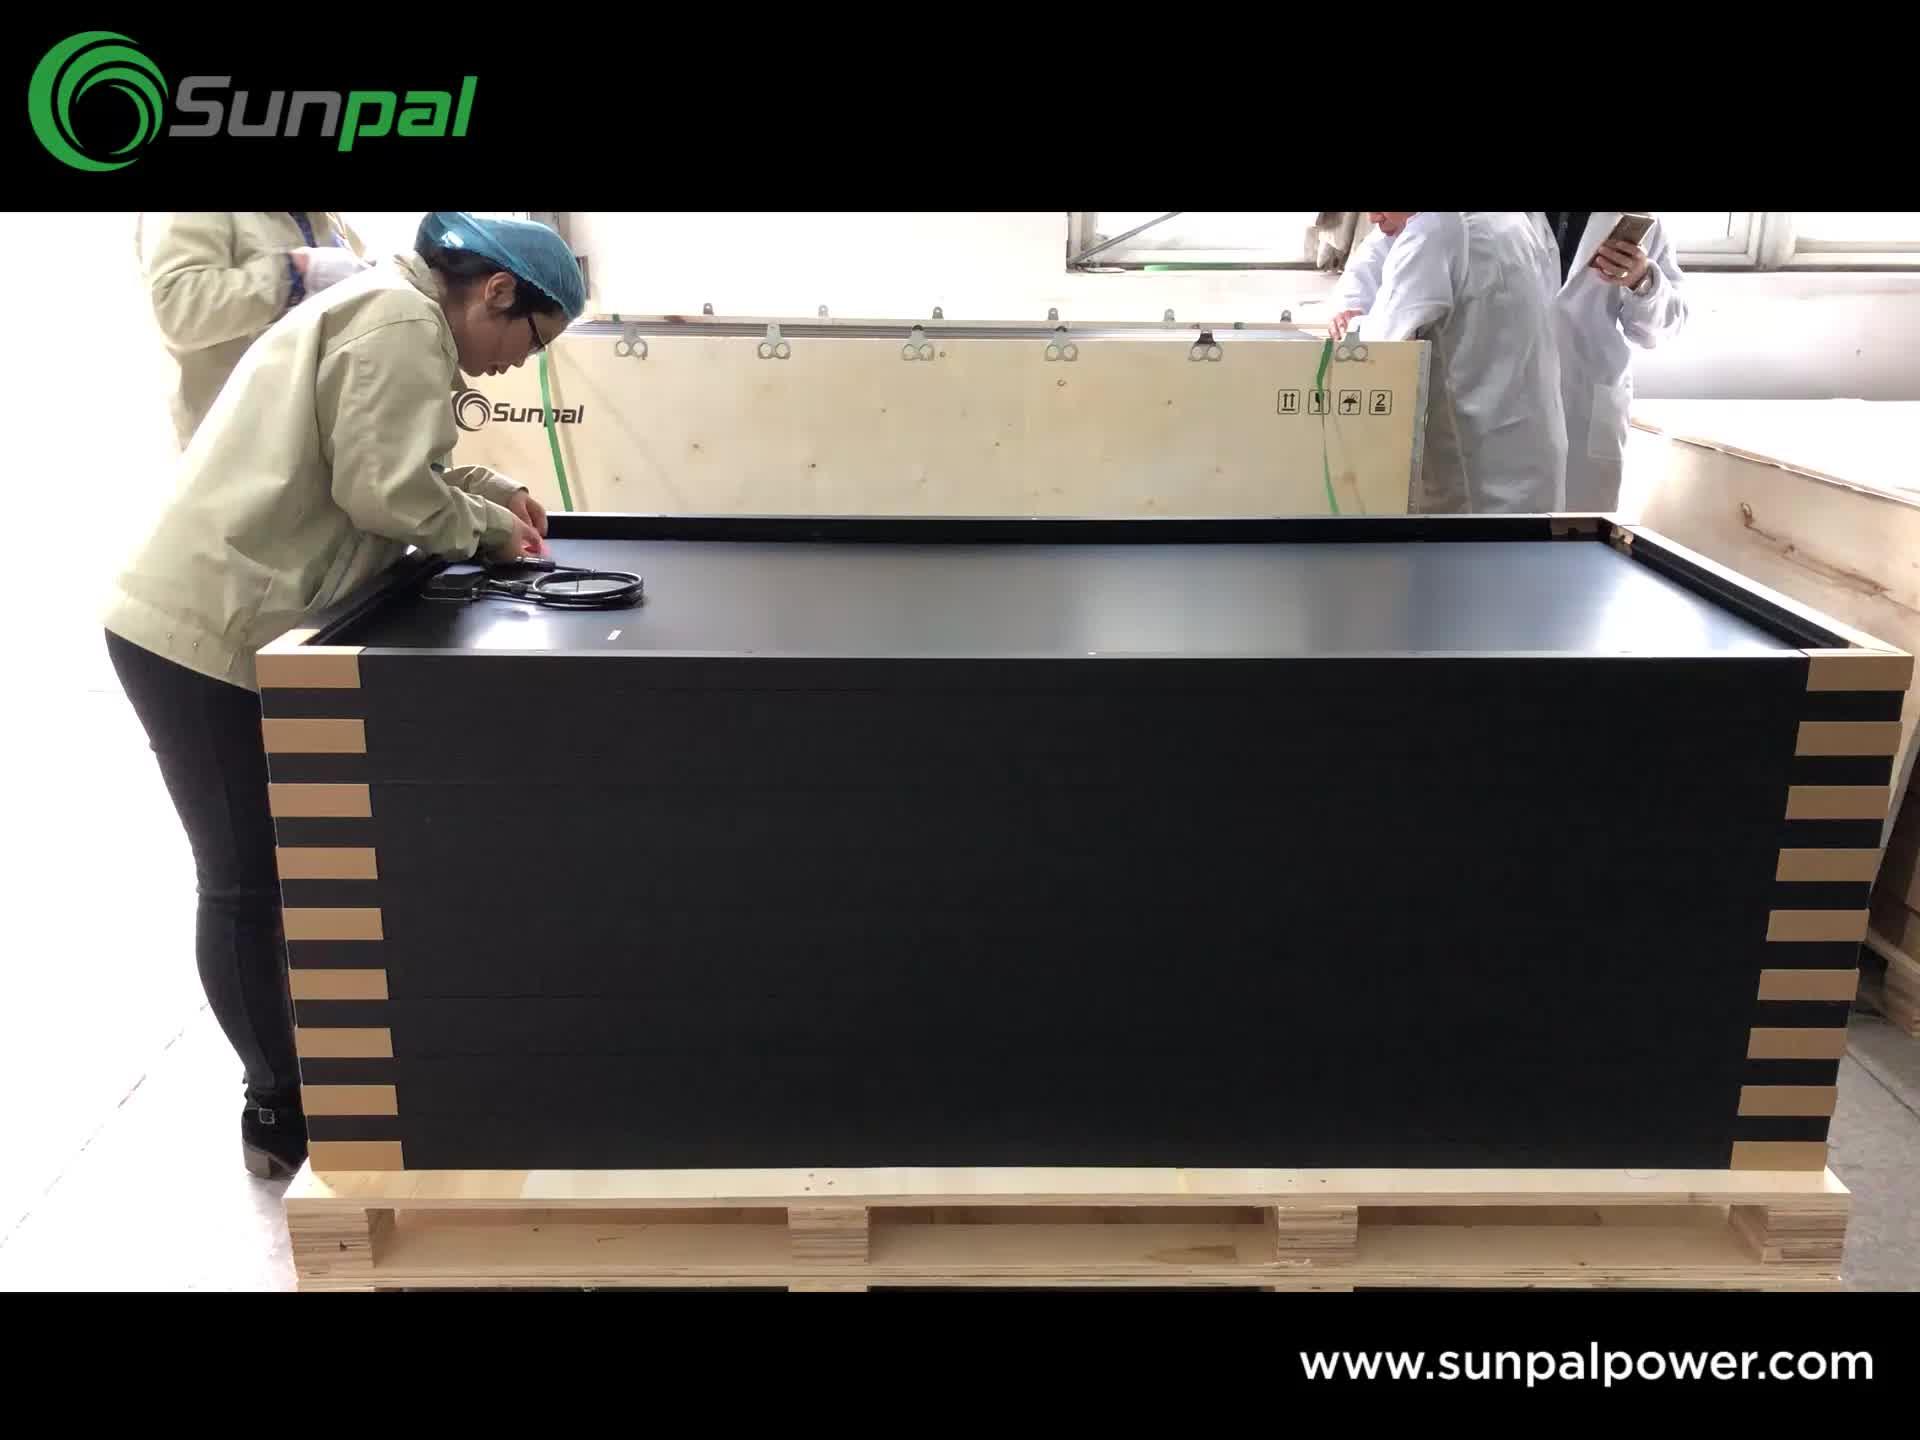 Sunpal 新デザイン 3Kw 太陽エネルギーシステム 3000 ワット 3KW 太陽エネルギー家庭用